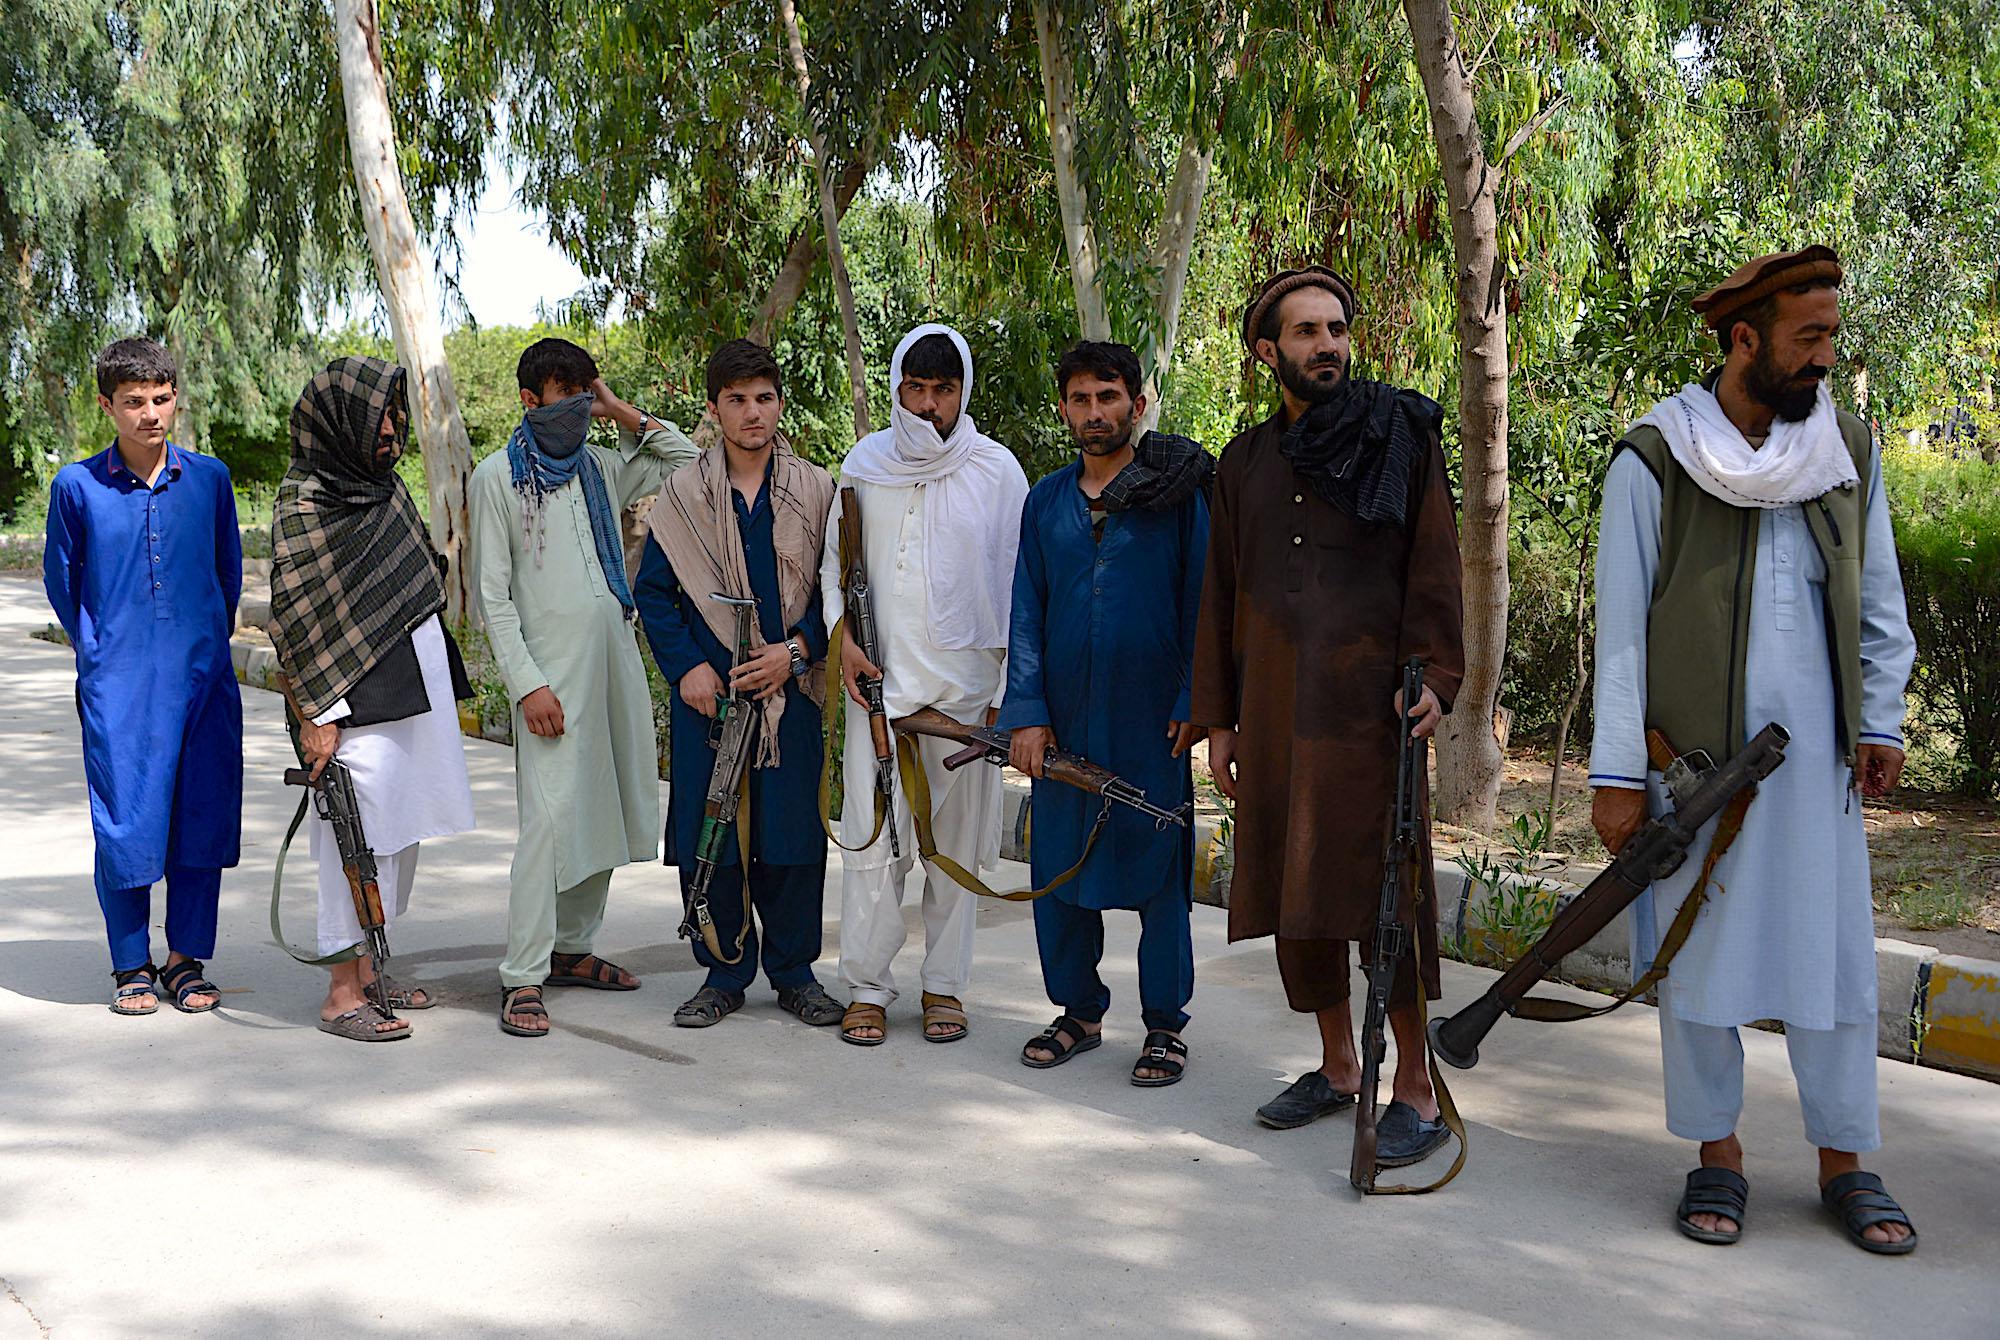 'Fighting has no benefit', say Taliban joining peace process in Nangarhar